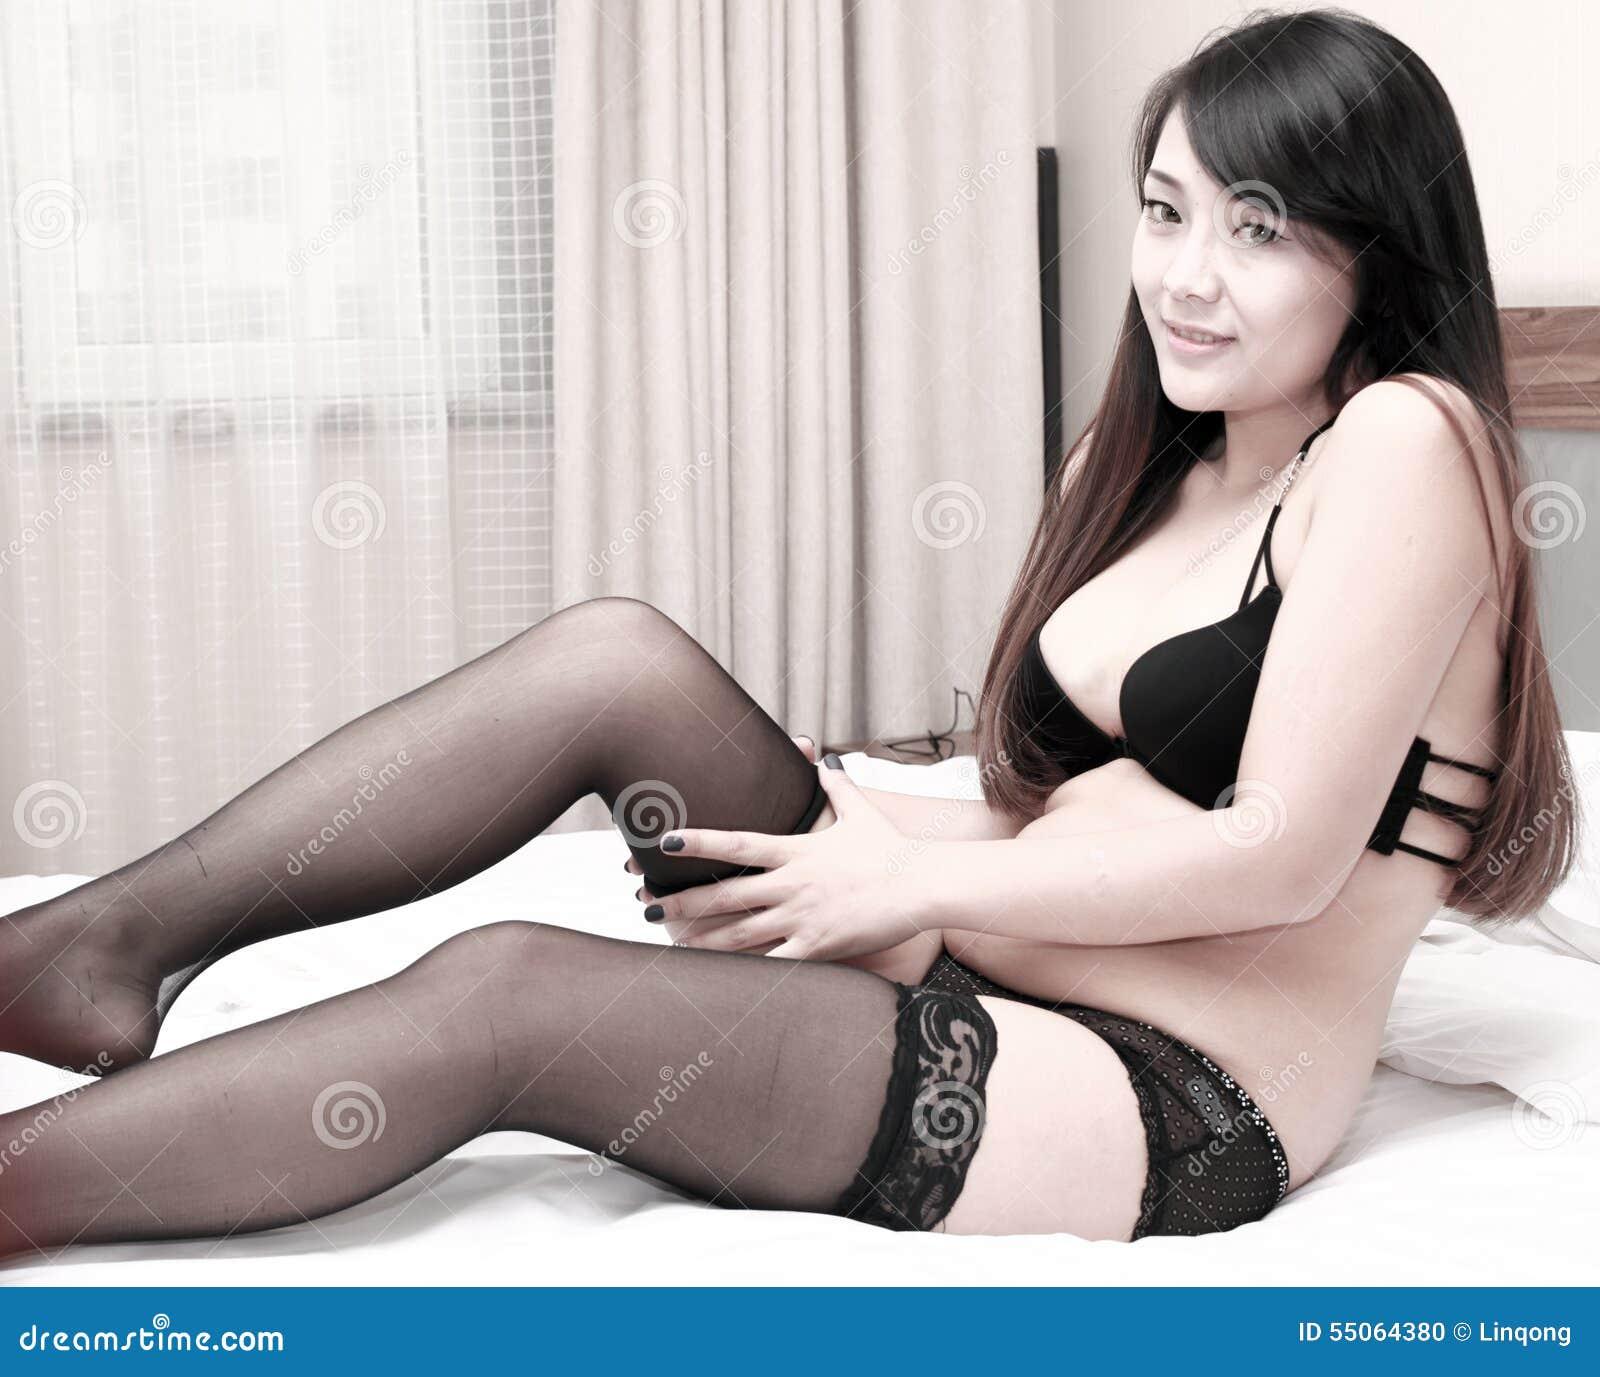 porn sex type